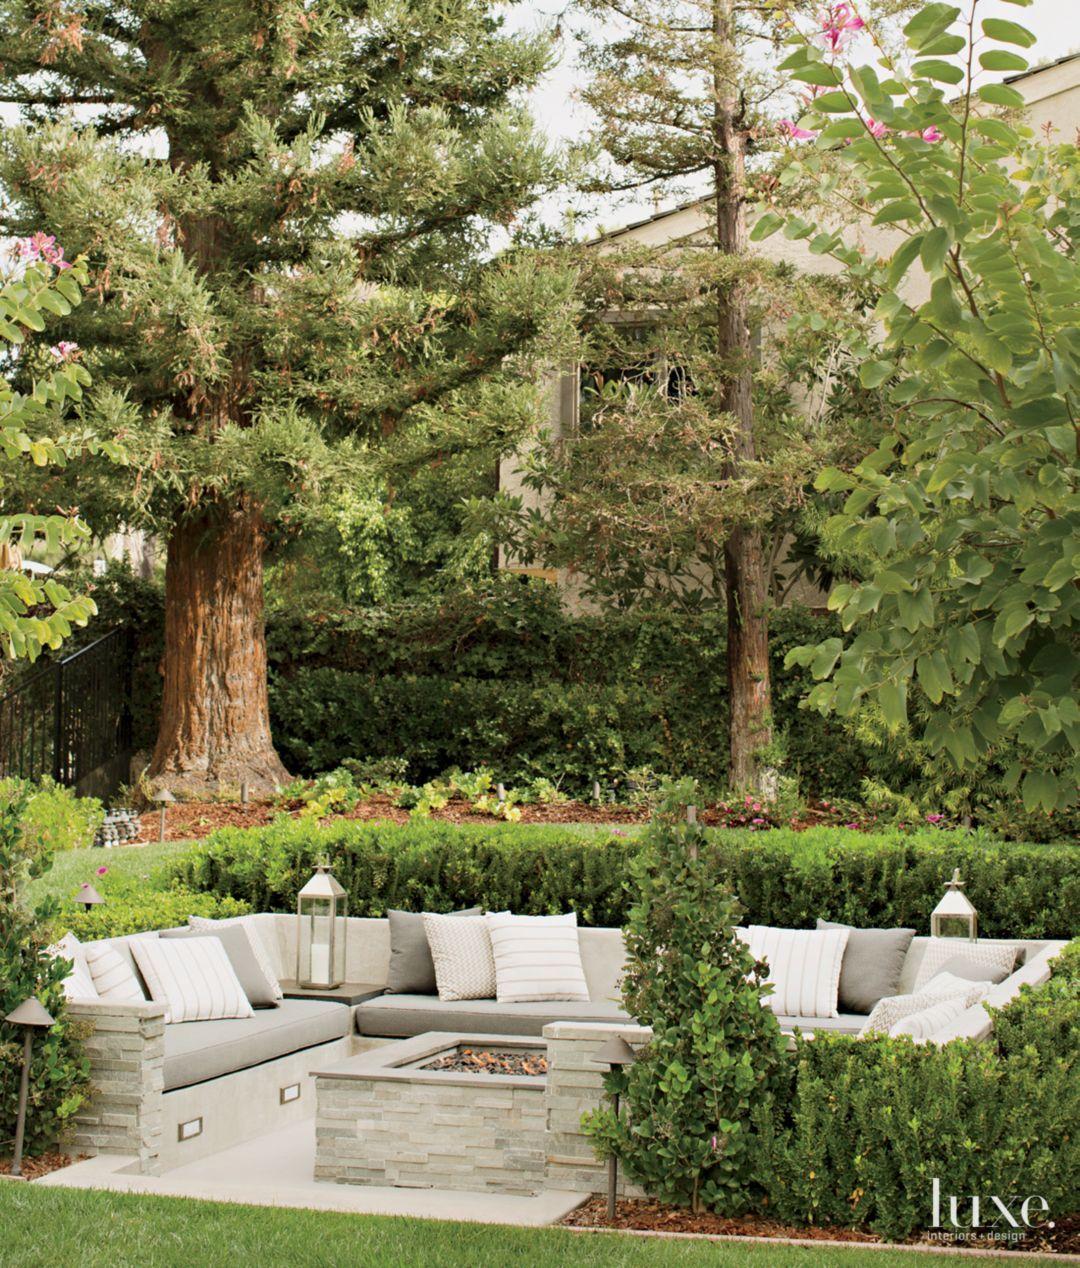 Garden Seating Ideas For Your Outdoor Living Room: Contemporary Backyard Landscape